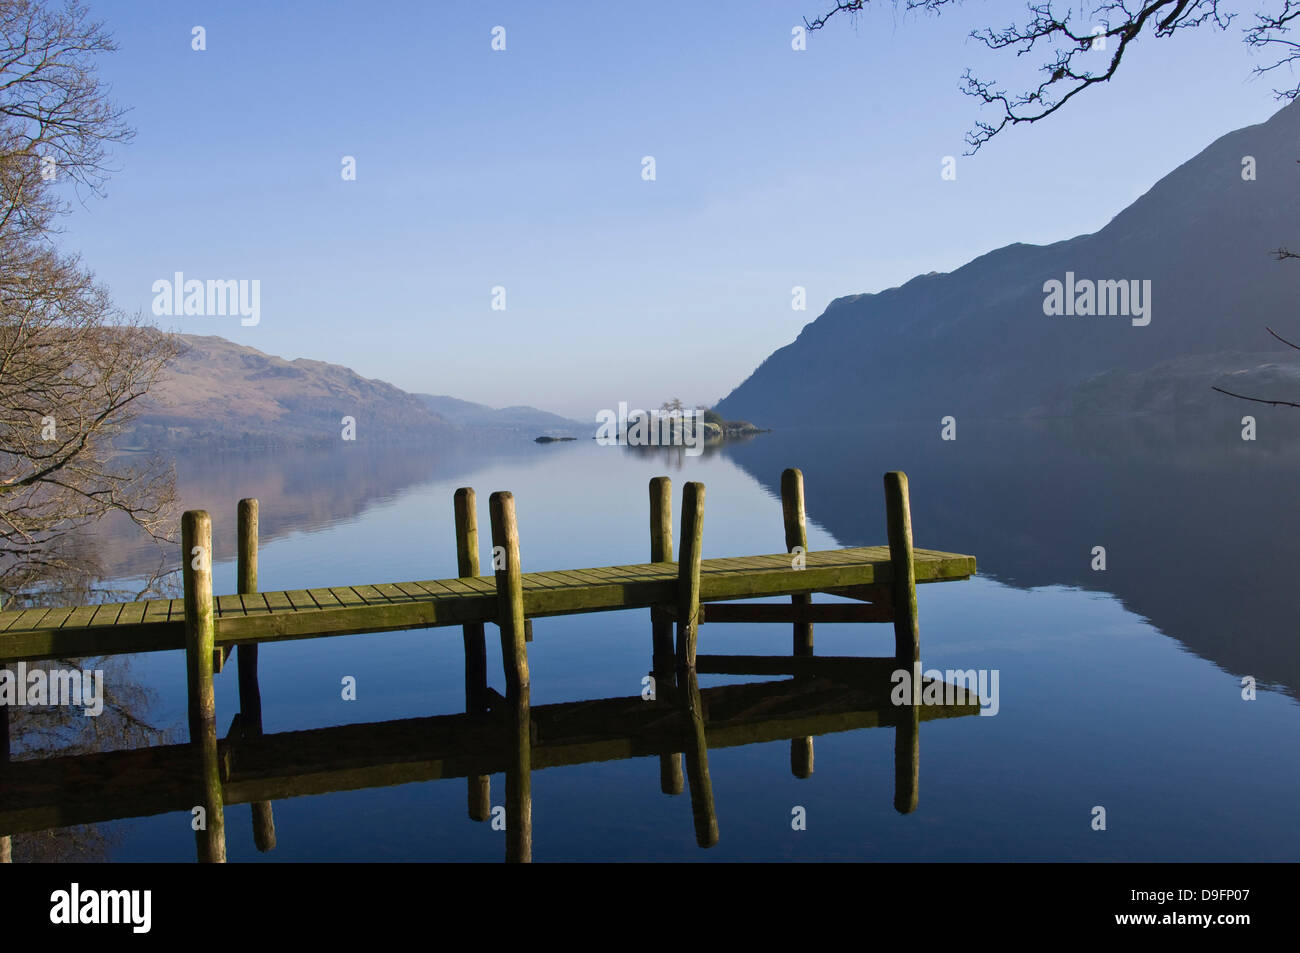 Lake Ullswater, Lake District National Park, Cumbria, England, UK - Stock Image